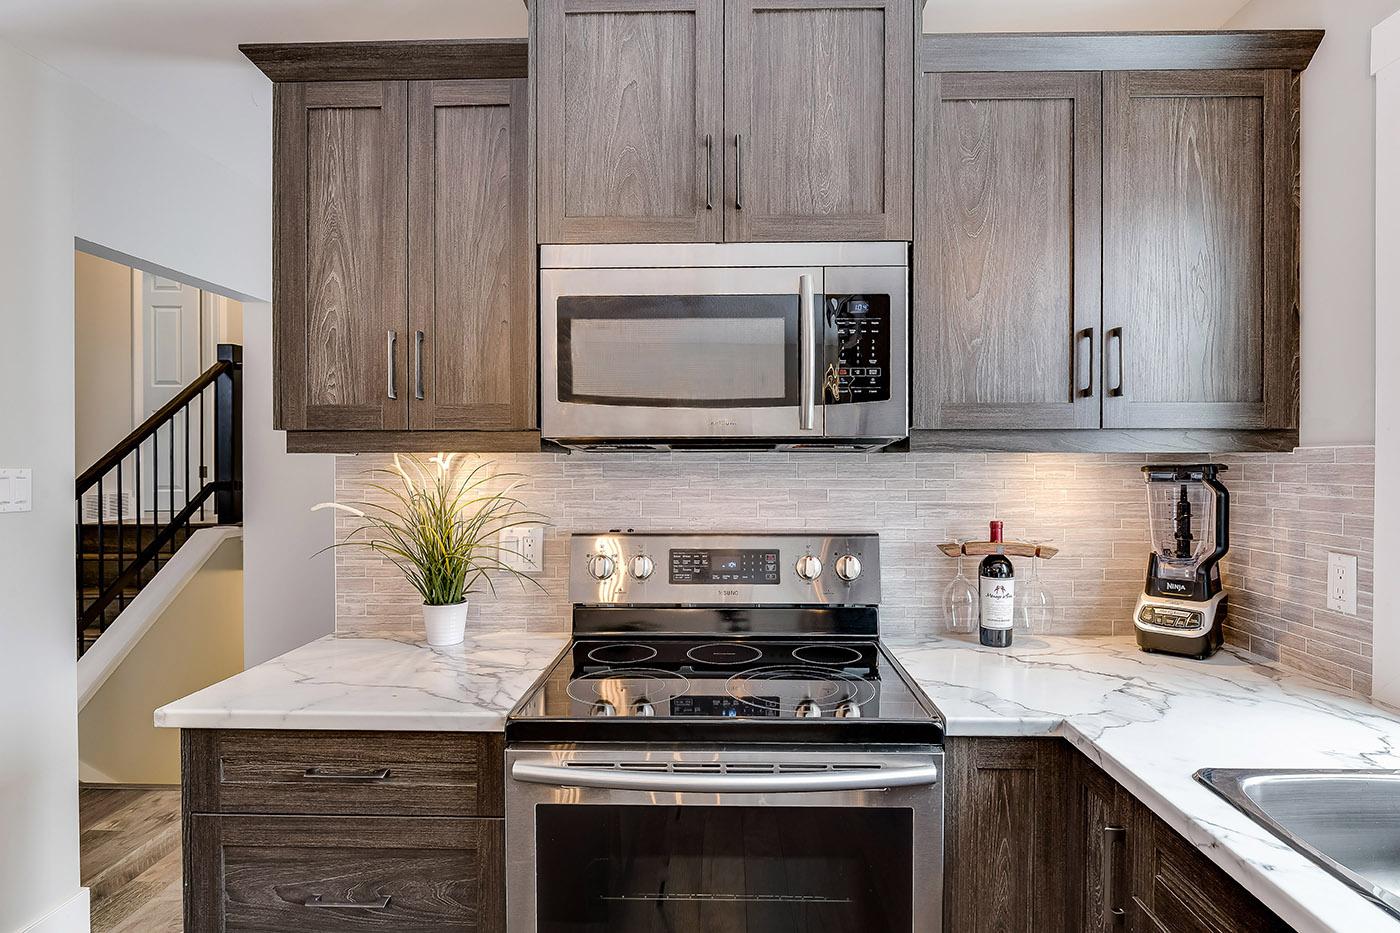 valances for kitchen pendant lighting under cabinet concealment options superior cabinets dark melamine by finish name silva